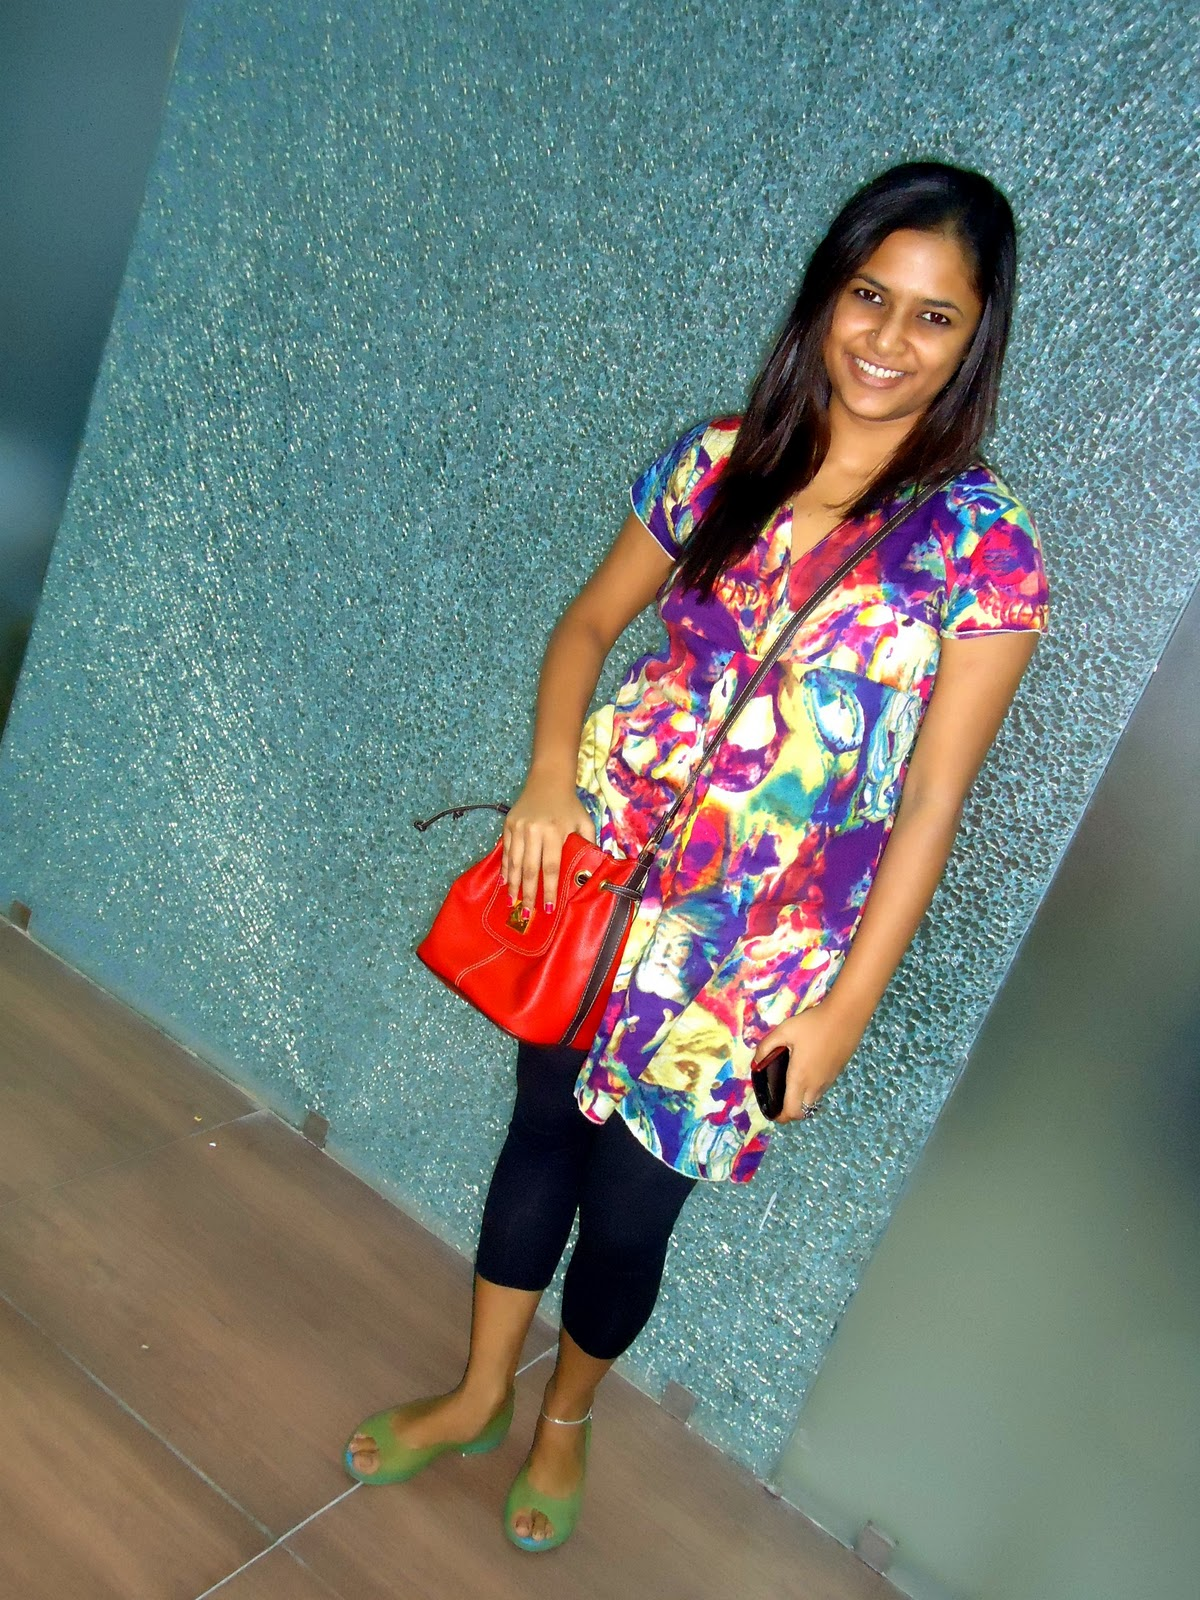 5a52e424c7f8d Bag- Bangkok Tunic- Fashion and You Leggings- 109 F Shoes- Crocs Anklet-  Local Shop